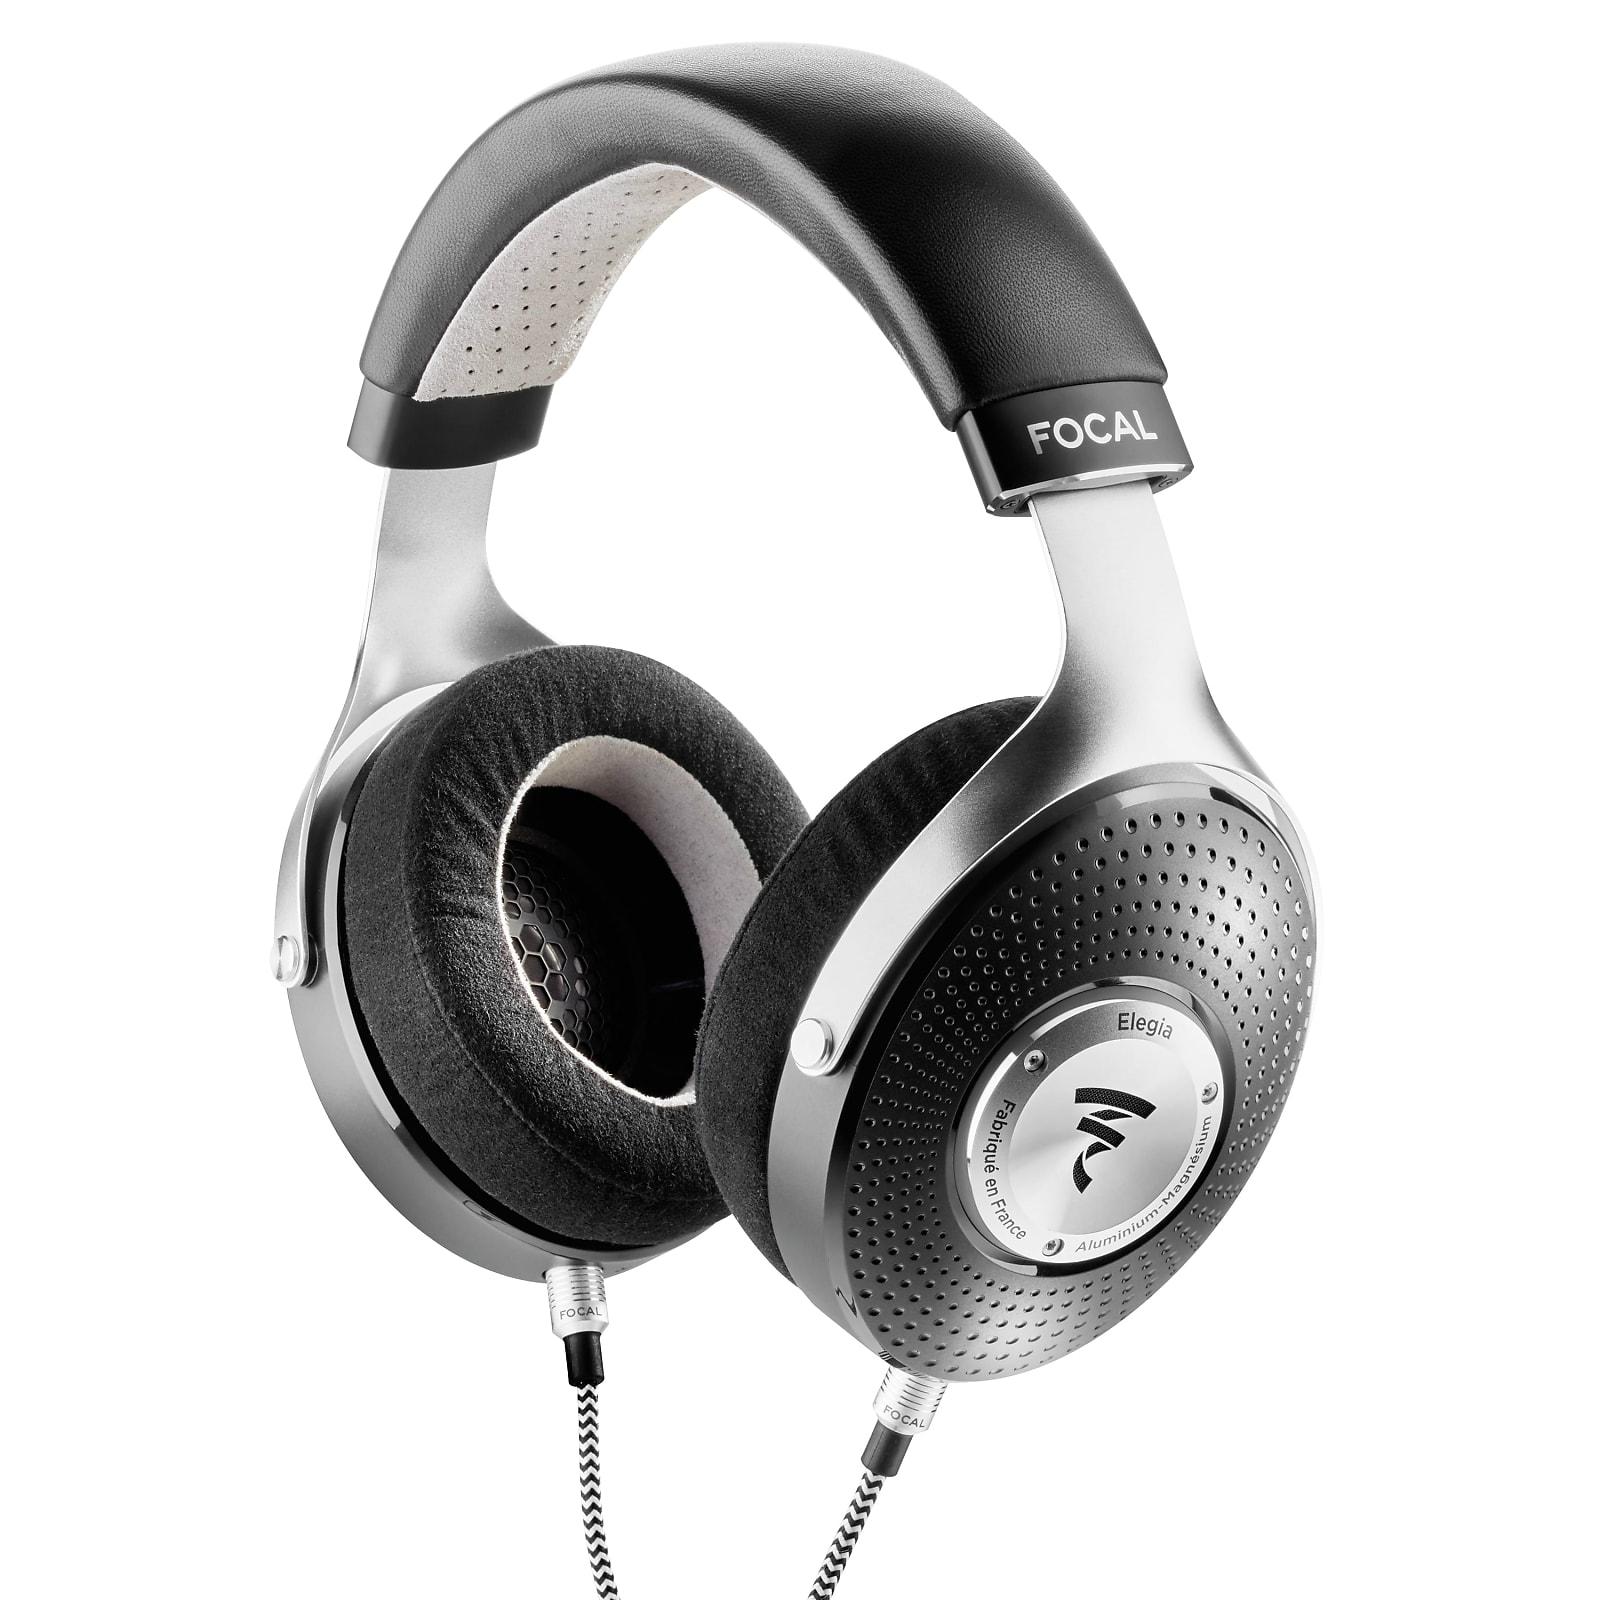 High End Headphones >> Focal Elegia High End Closed Back Headphones